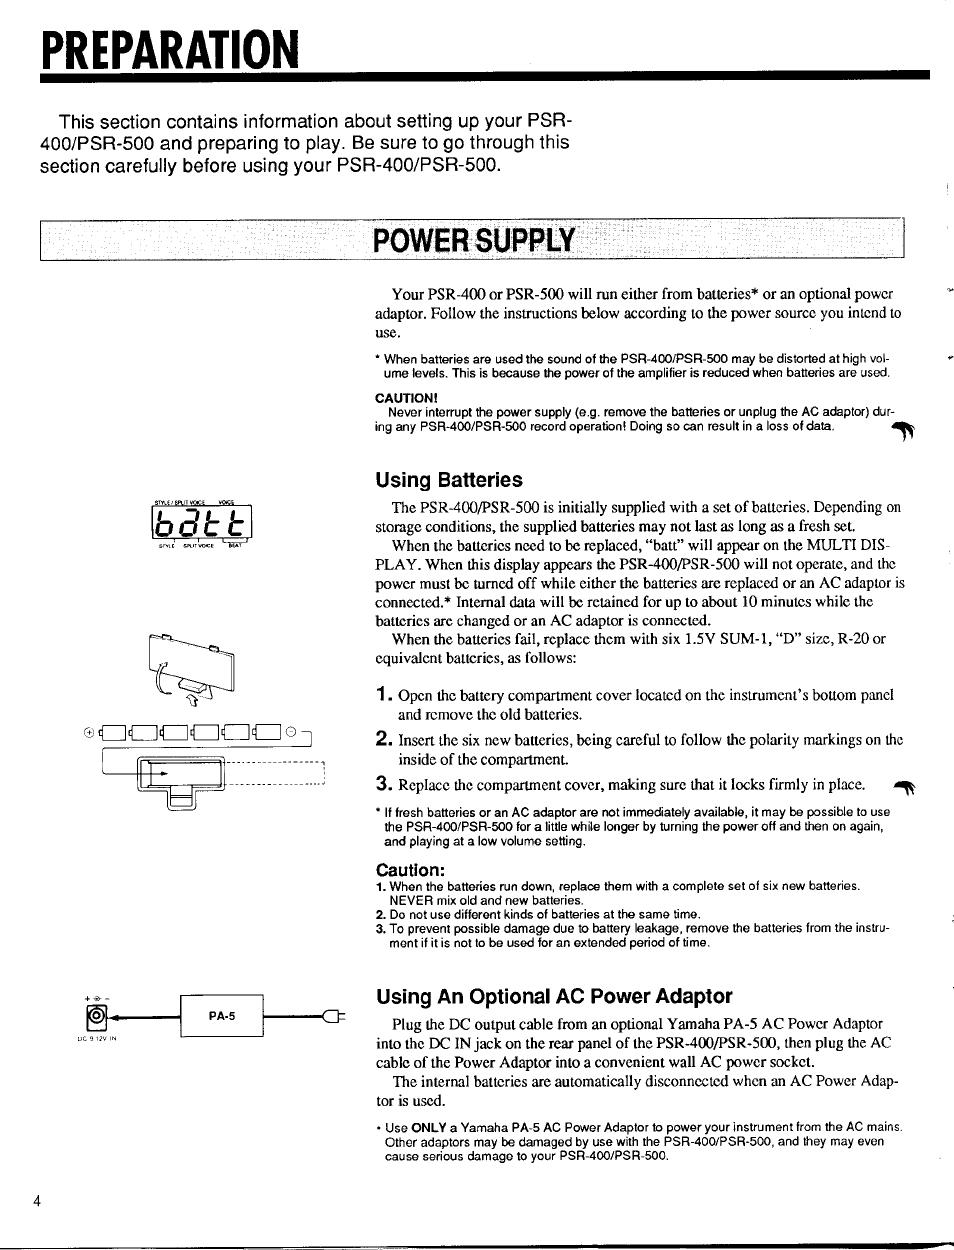 Preparation, Power supply, Using batteries | Yamaha PSR-400 User Manual |  Page 6 / 47